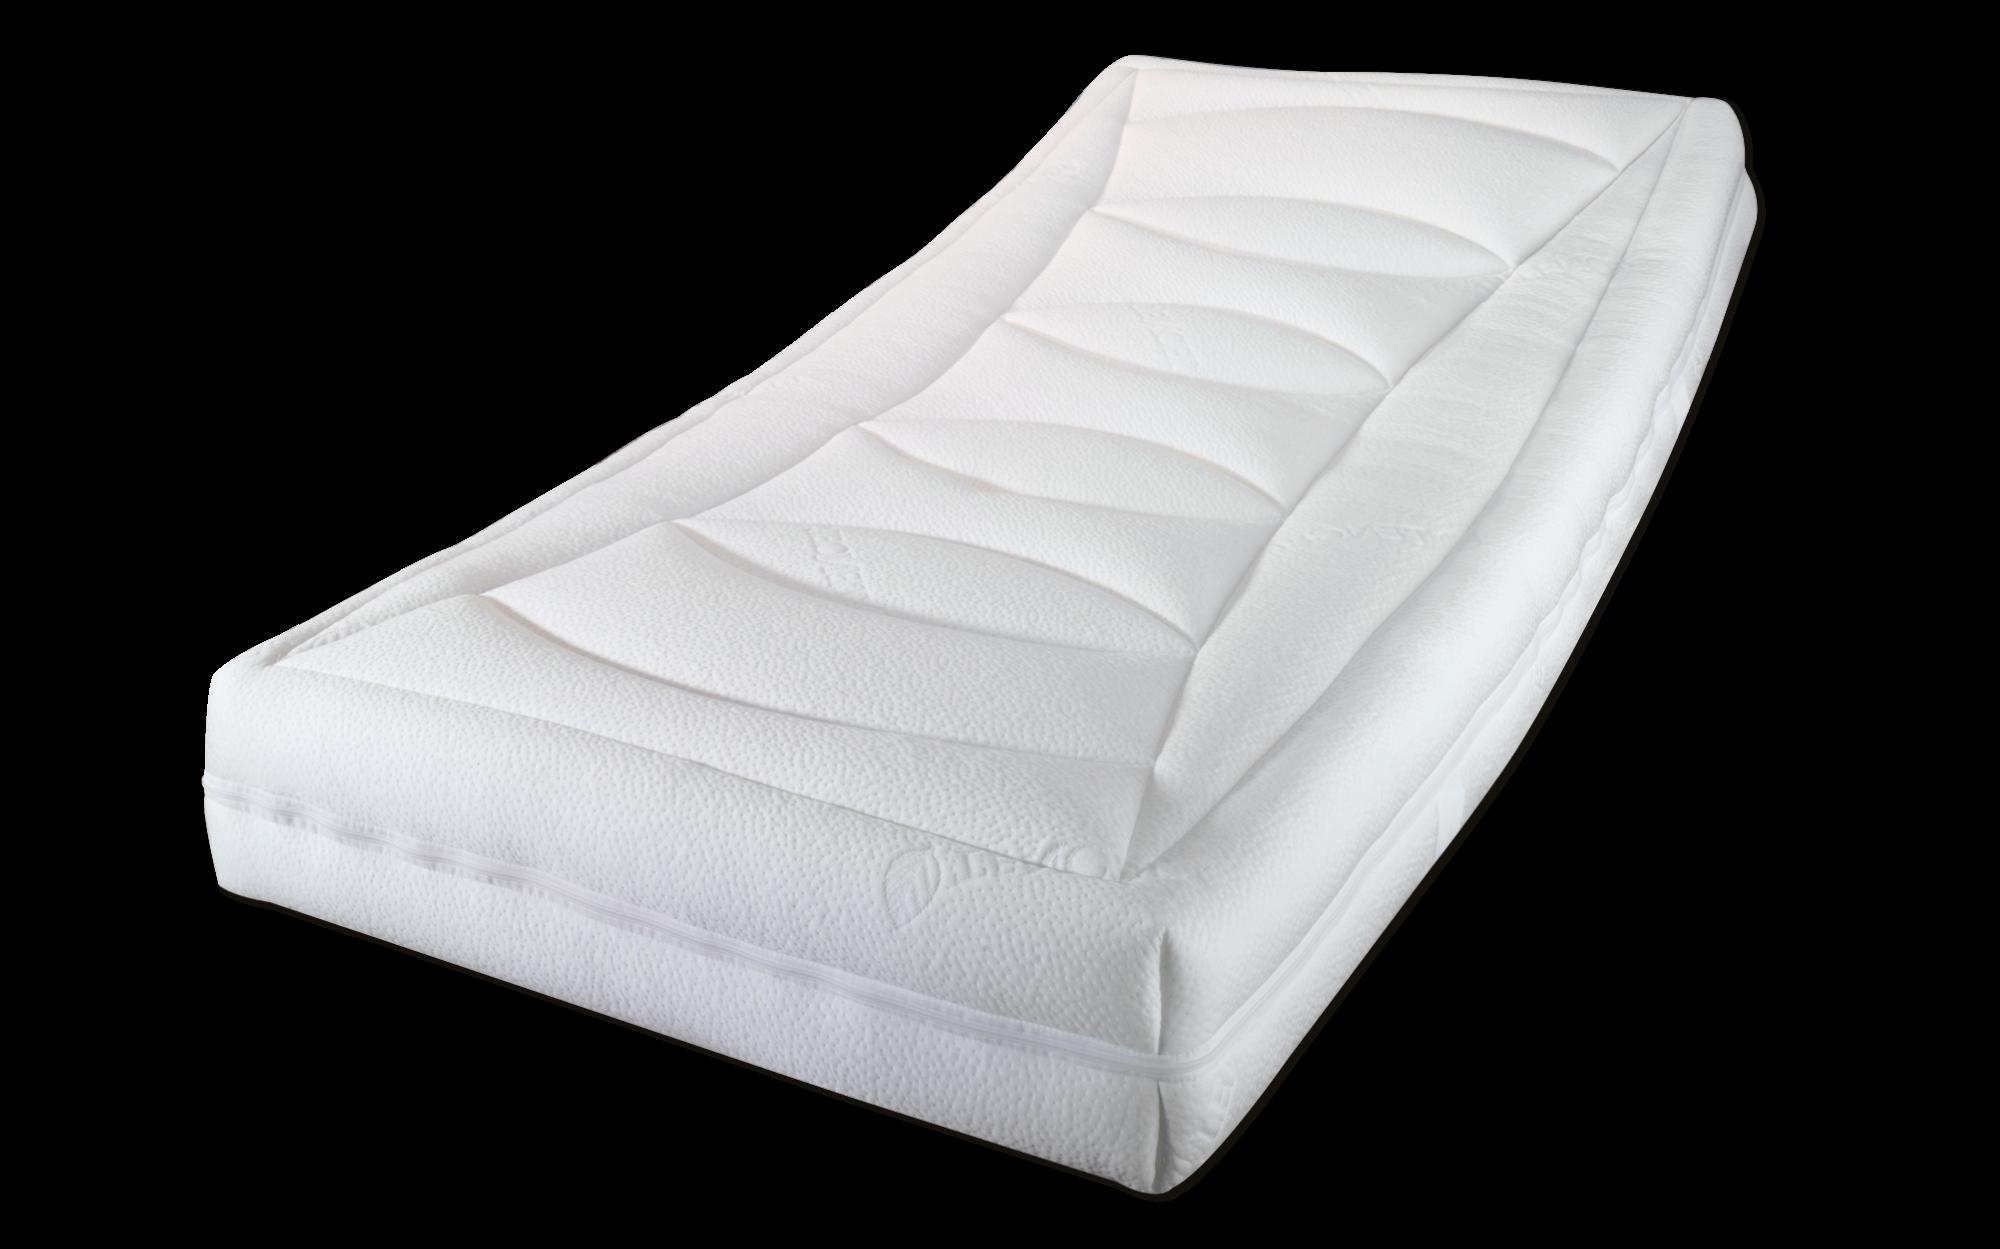 f a n frankenstolz adaptionsmatratze comfort t 90x200 cm h4 tonnentaschenfederkernmatratze. Black Bedroom Furniture Sets. Home Design Ideas